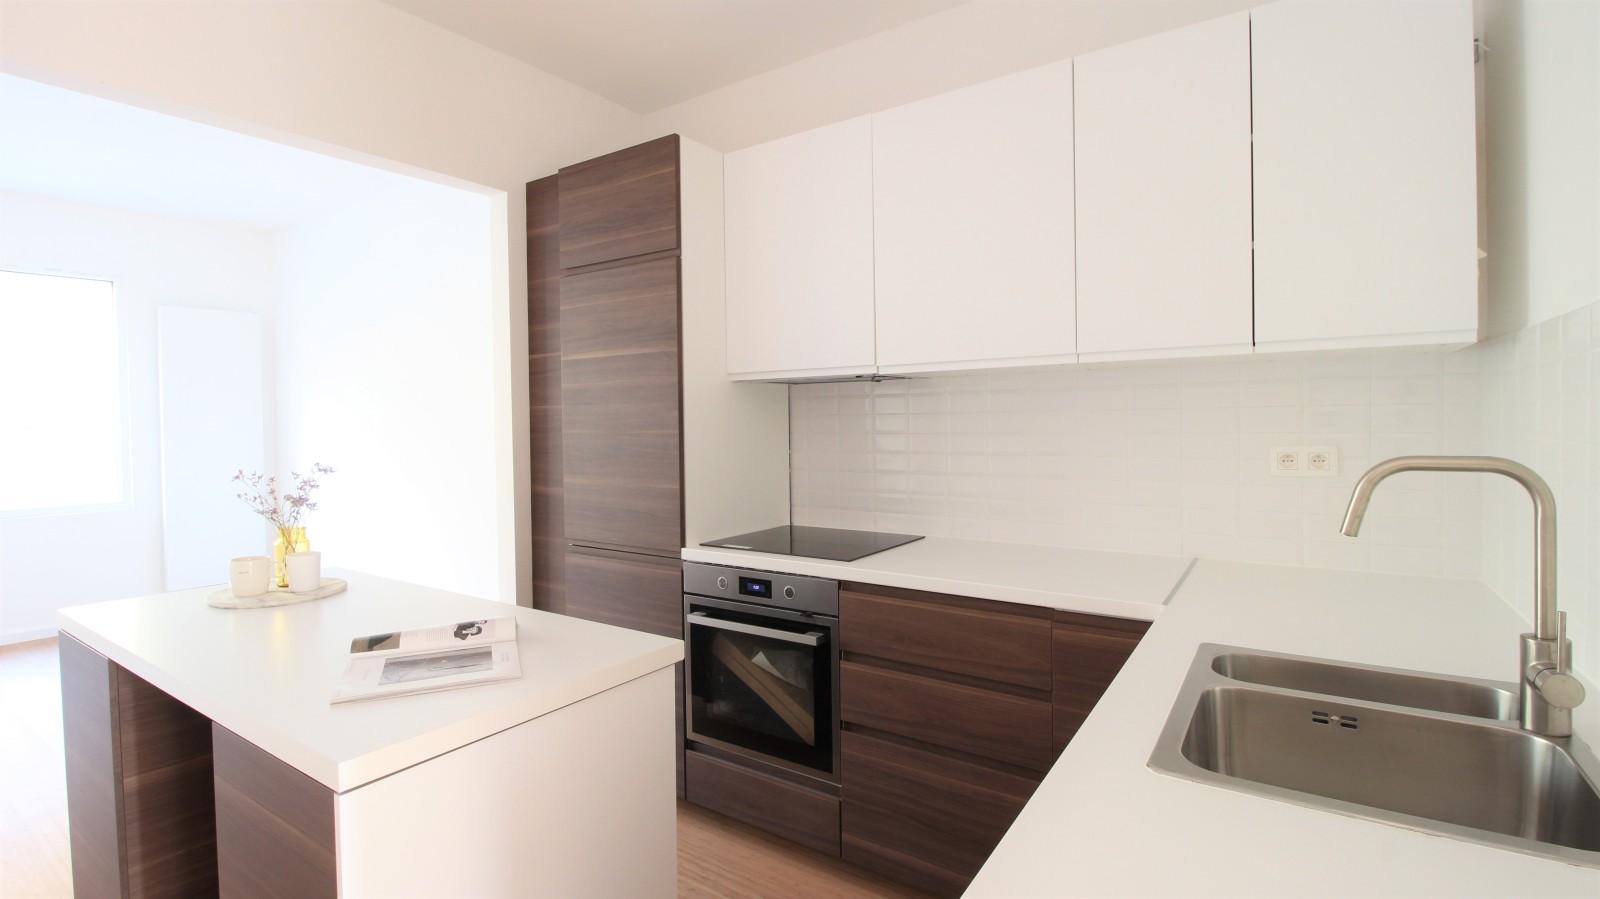 Gerenoveerd appartement met twee slaapkamers op centrale ligging te Mortsel! afbeelding 3